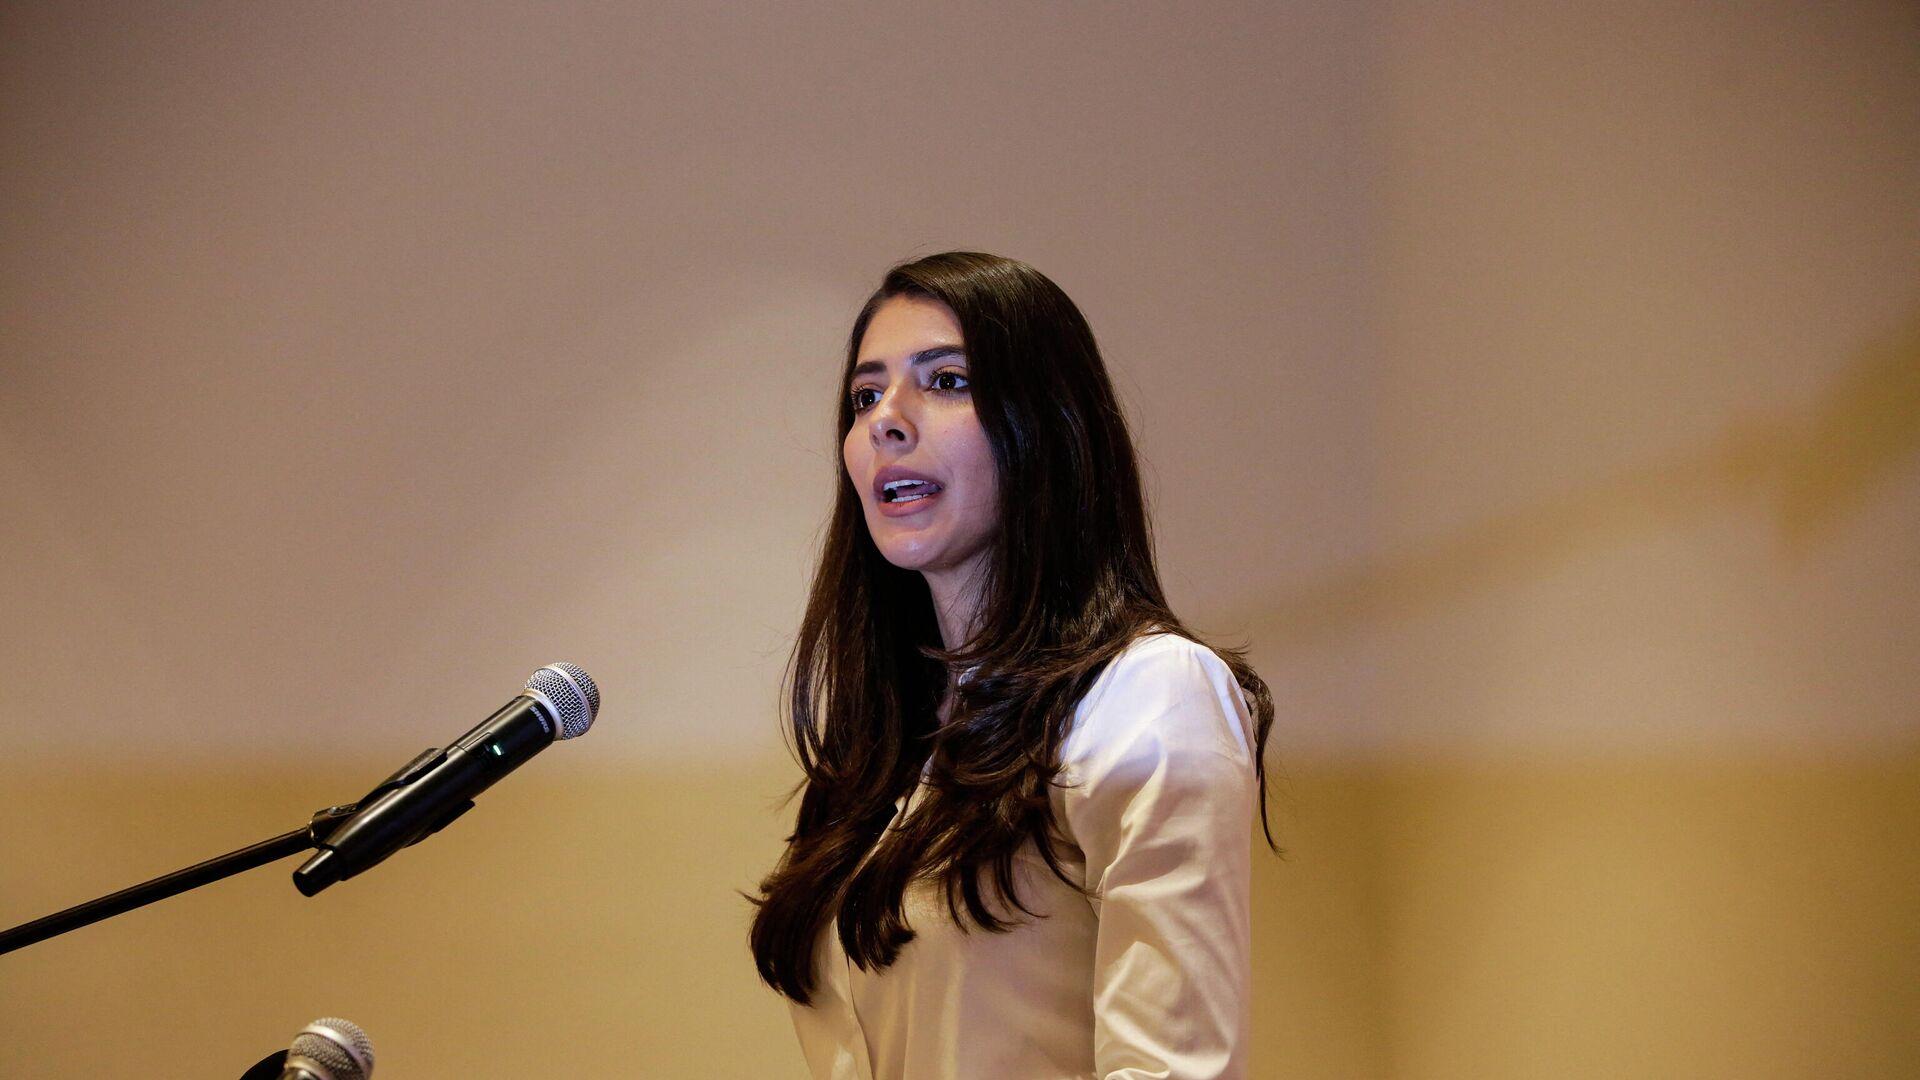 Berenice Quezada, candidata a la vicepresidencia de Nicaragua - Sputnik Mundo, 1920, 04.08.2021